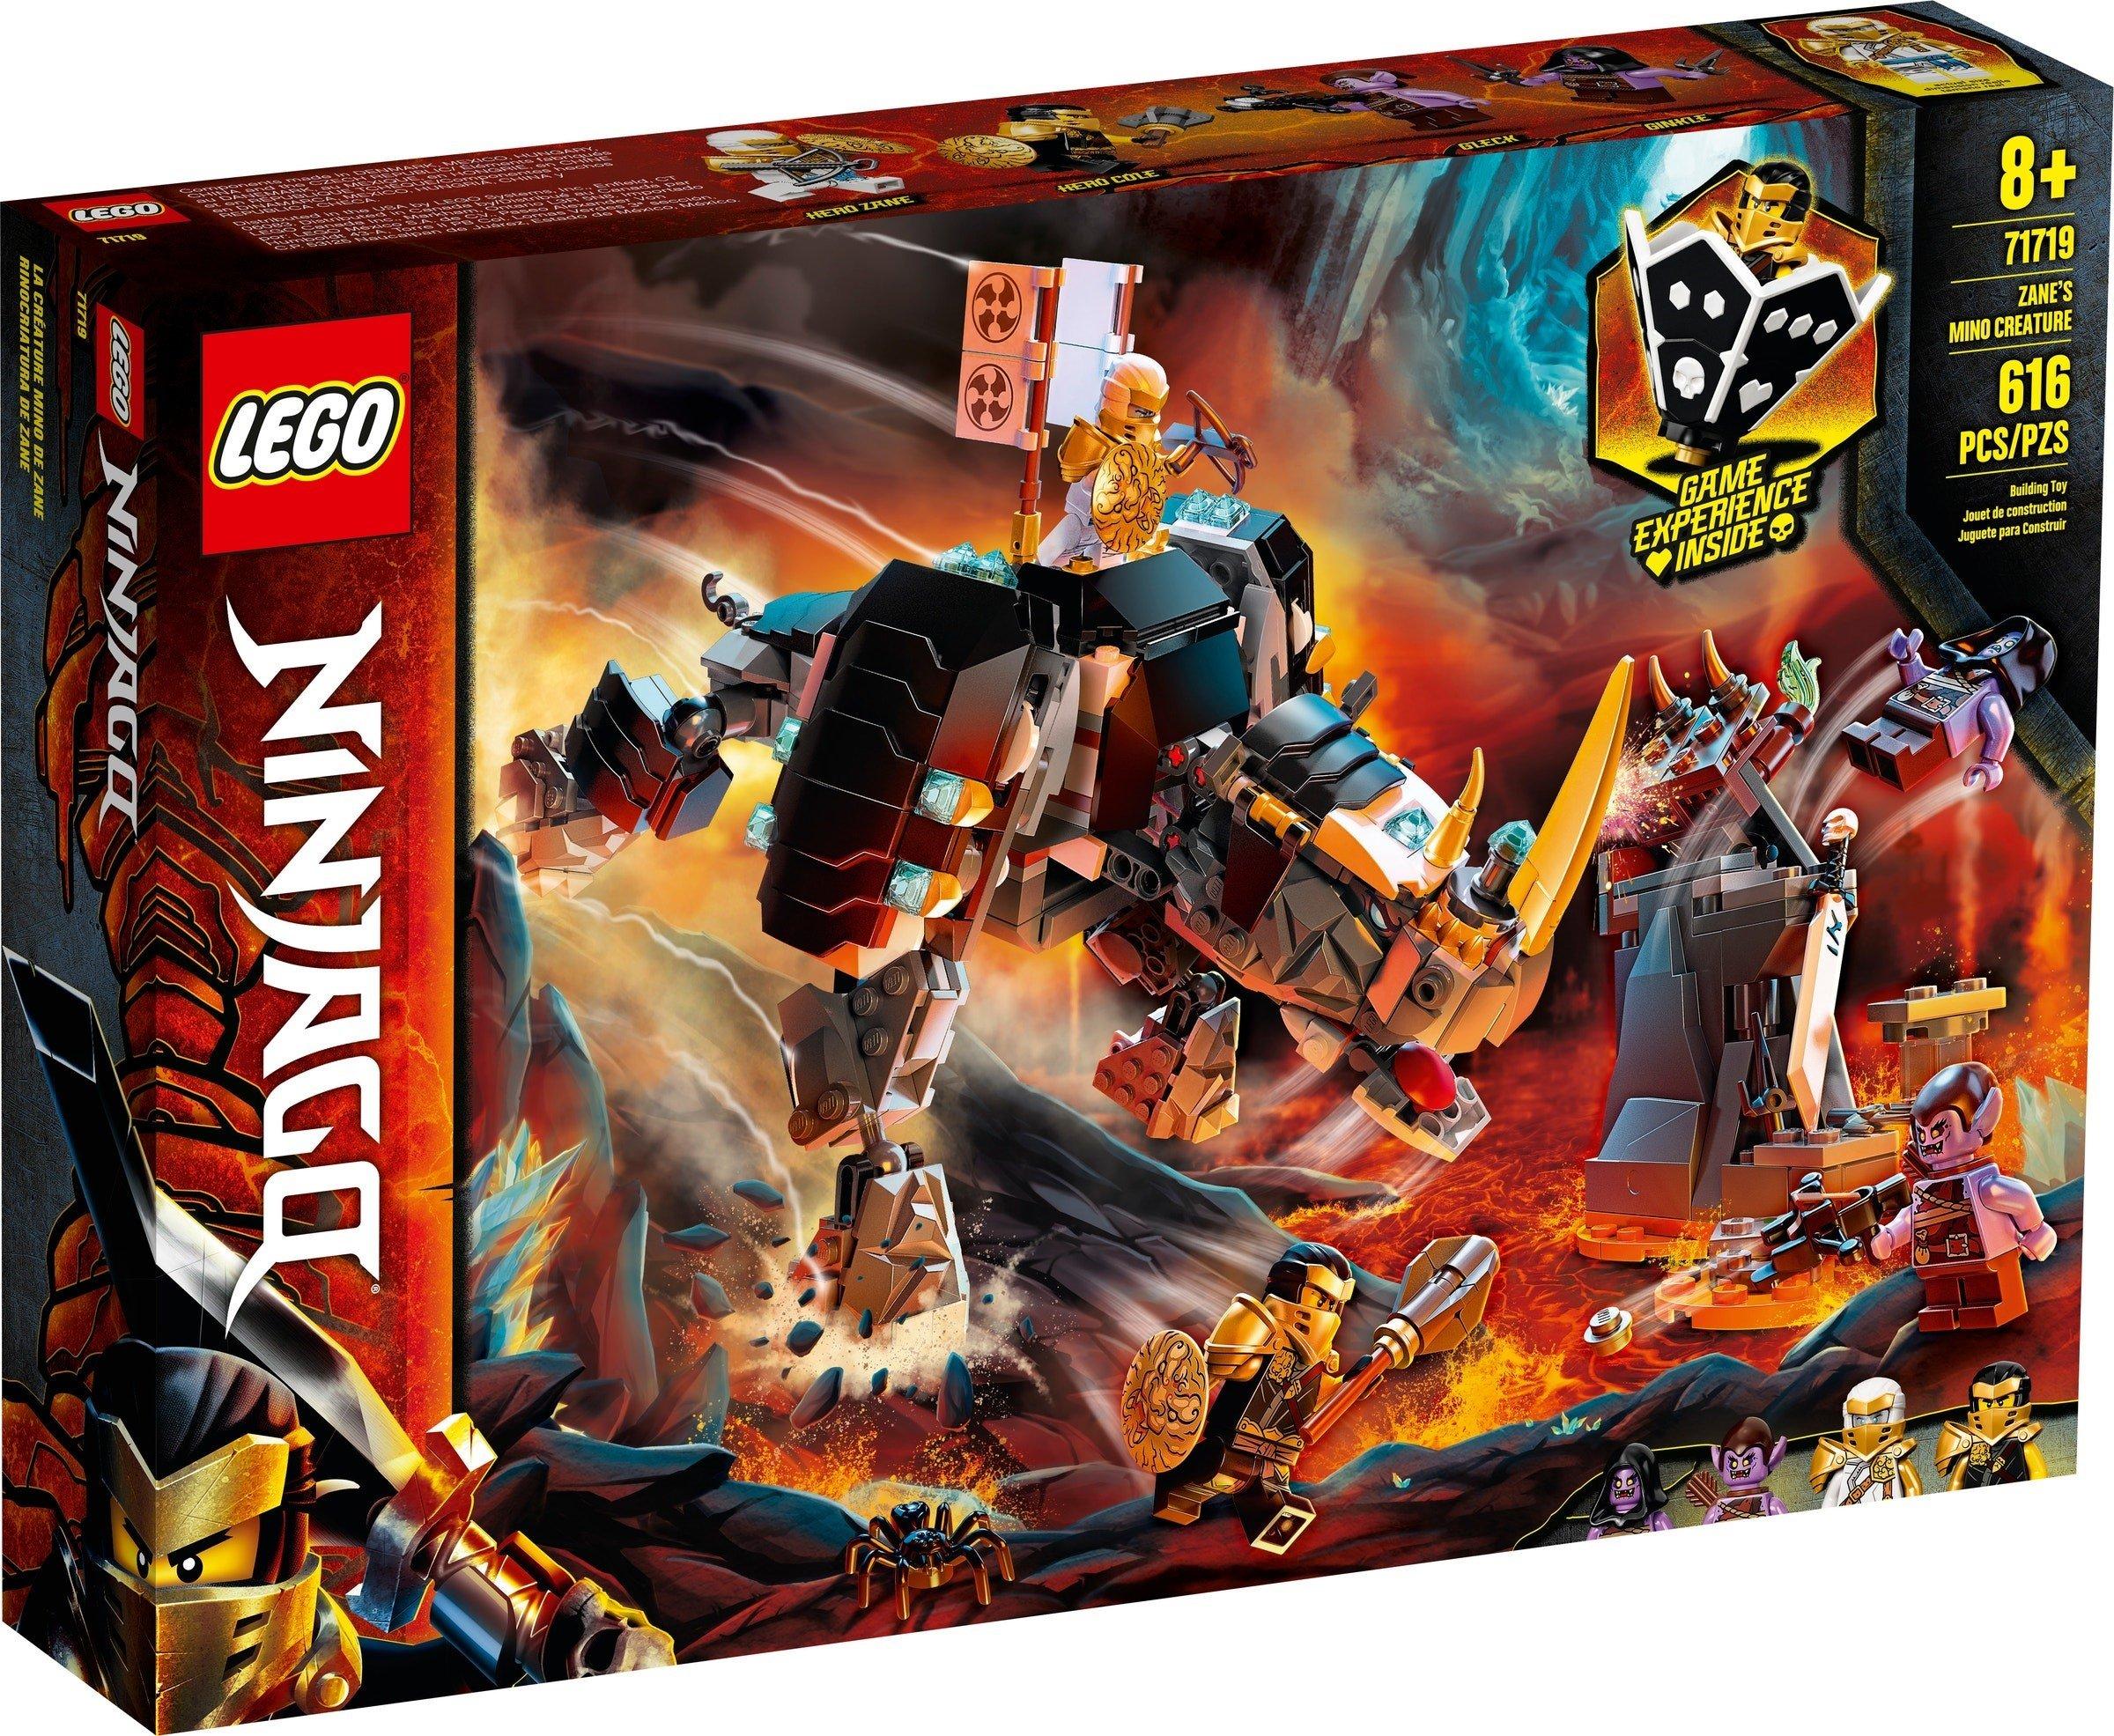 LEGO Ninjago - Zane's Mino Creature (71719)